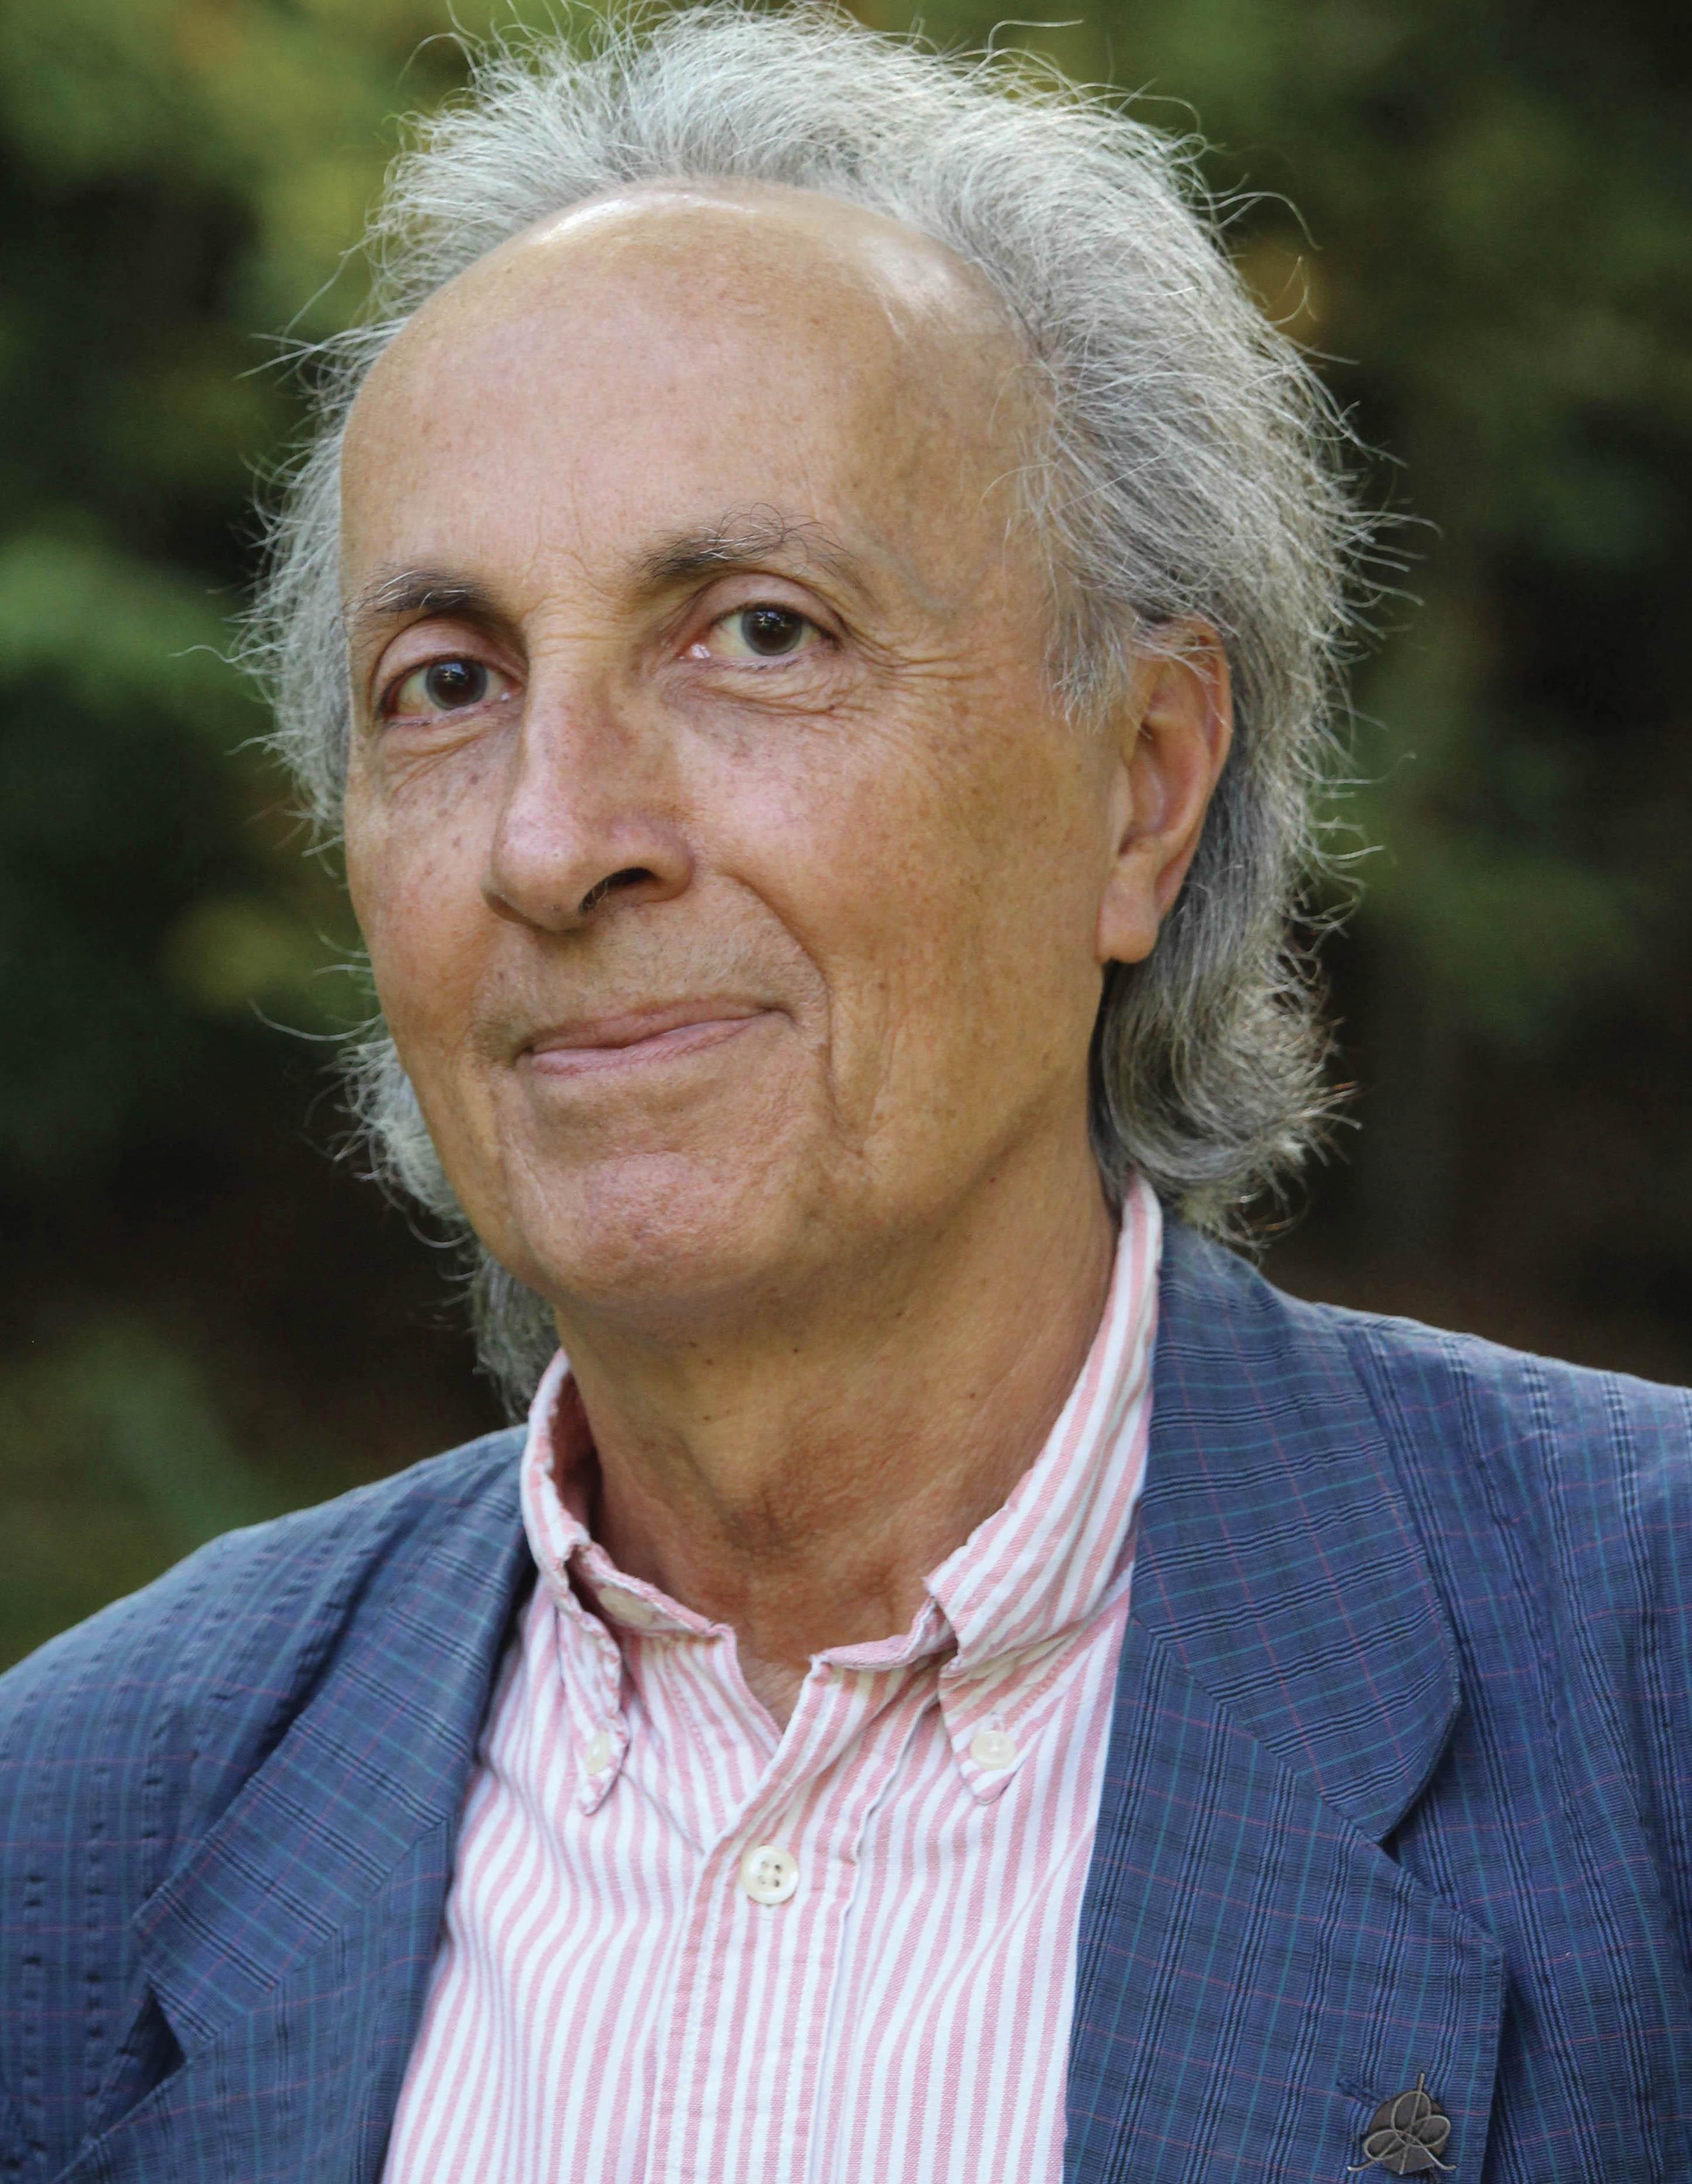 photo of Thibault Damour